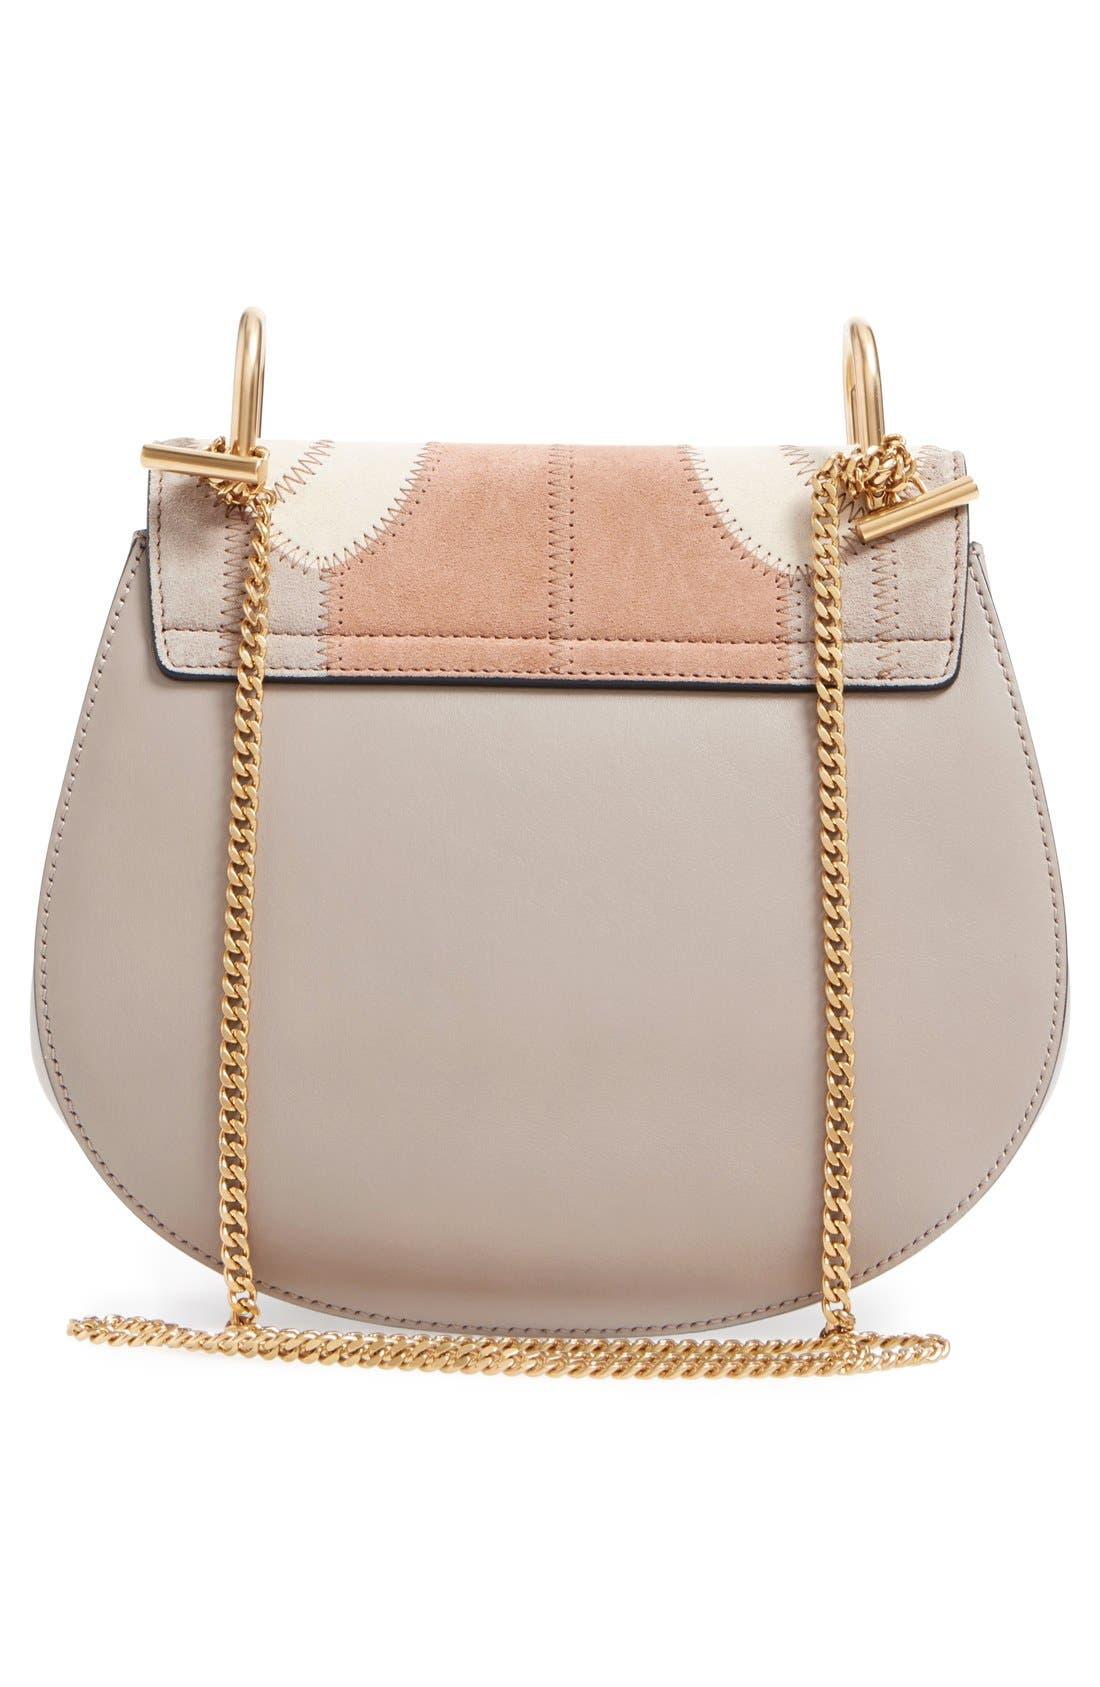 Alternate Image 3  - Chloé 'Small Drew' Patchwork Suede Shoulder Bag